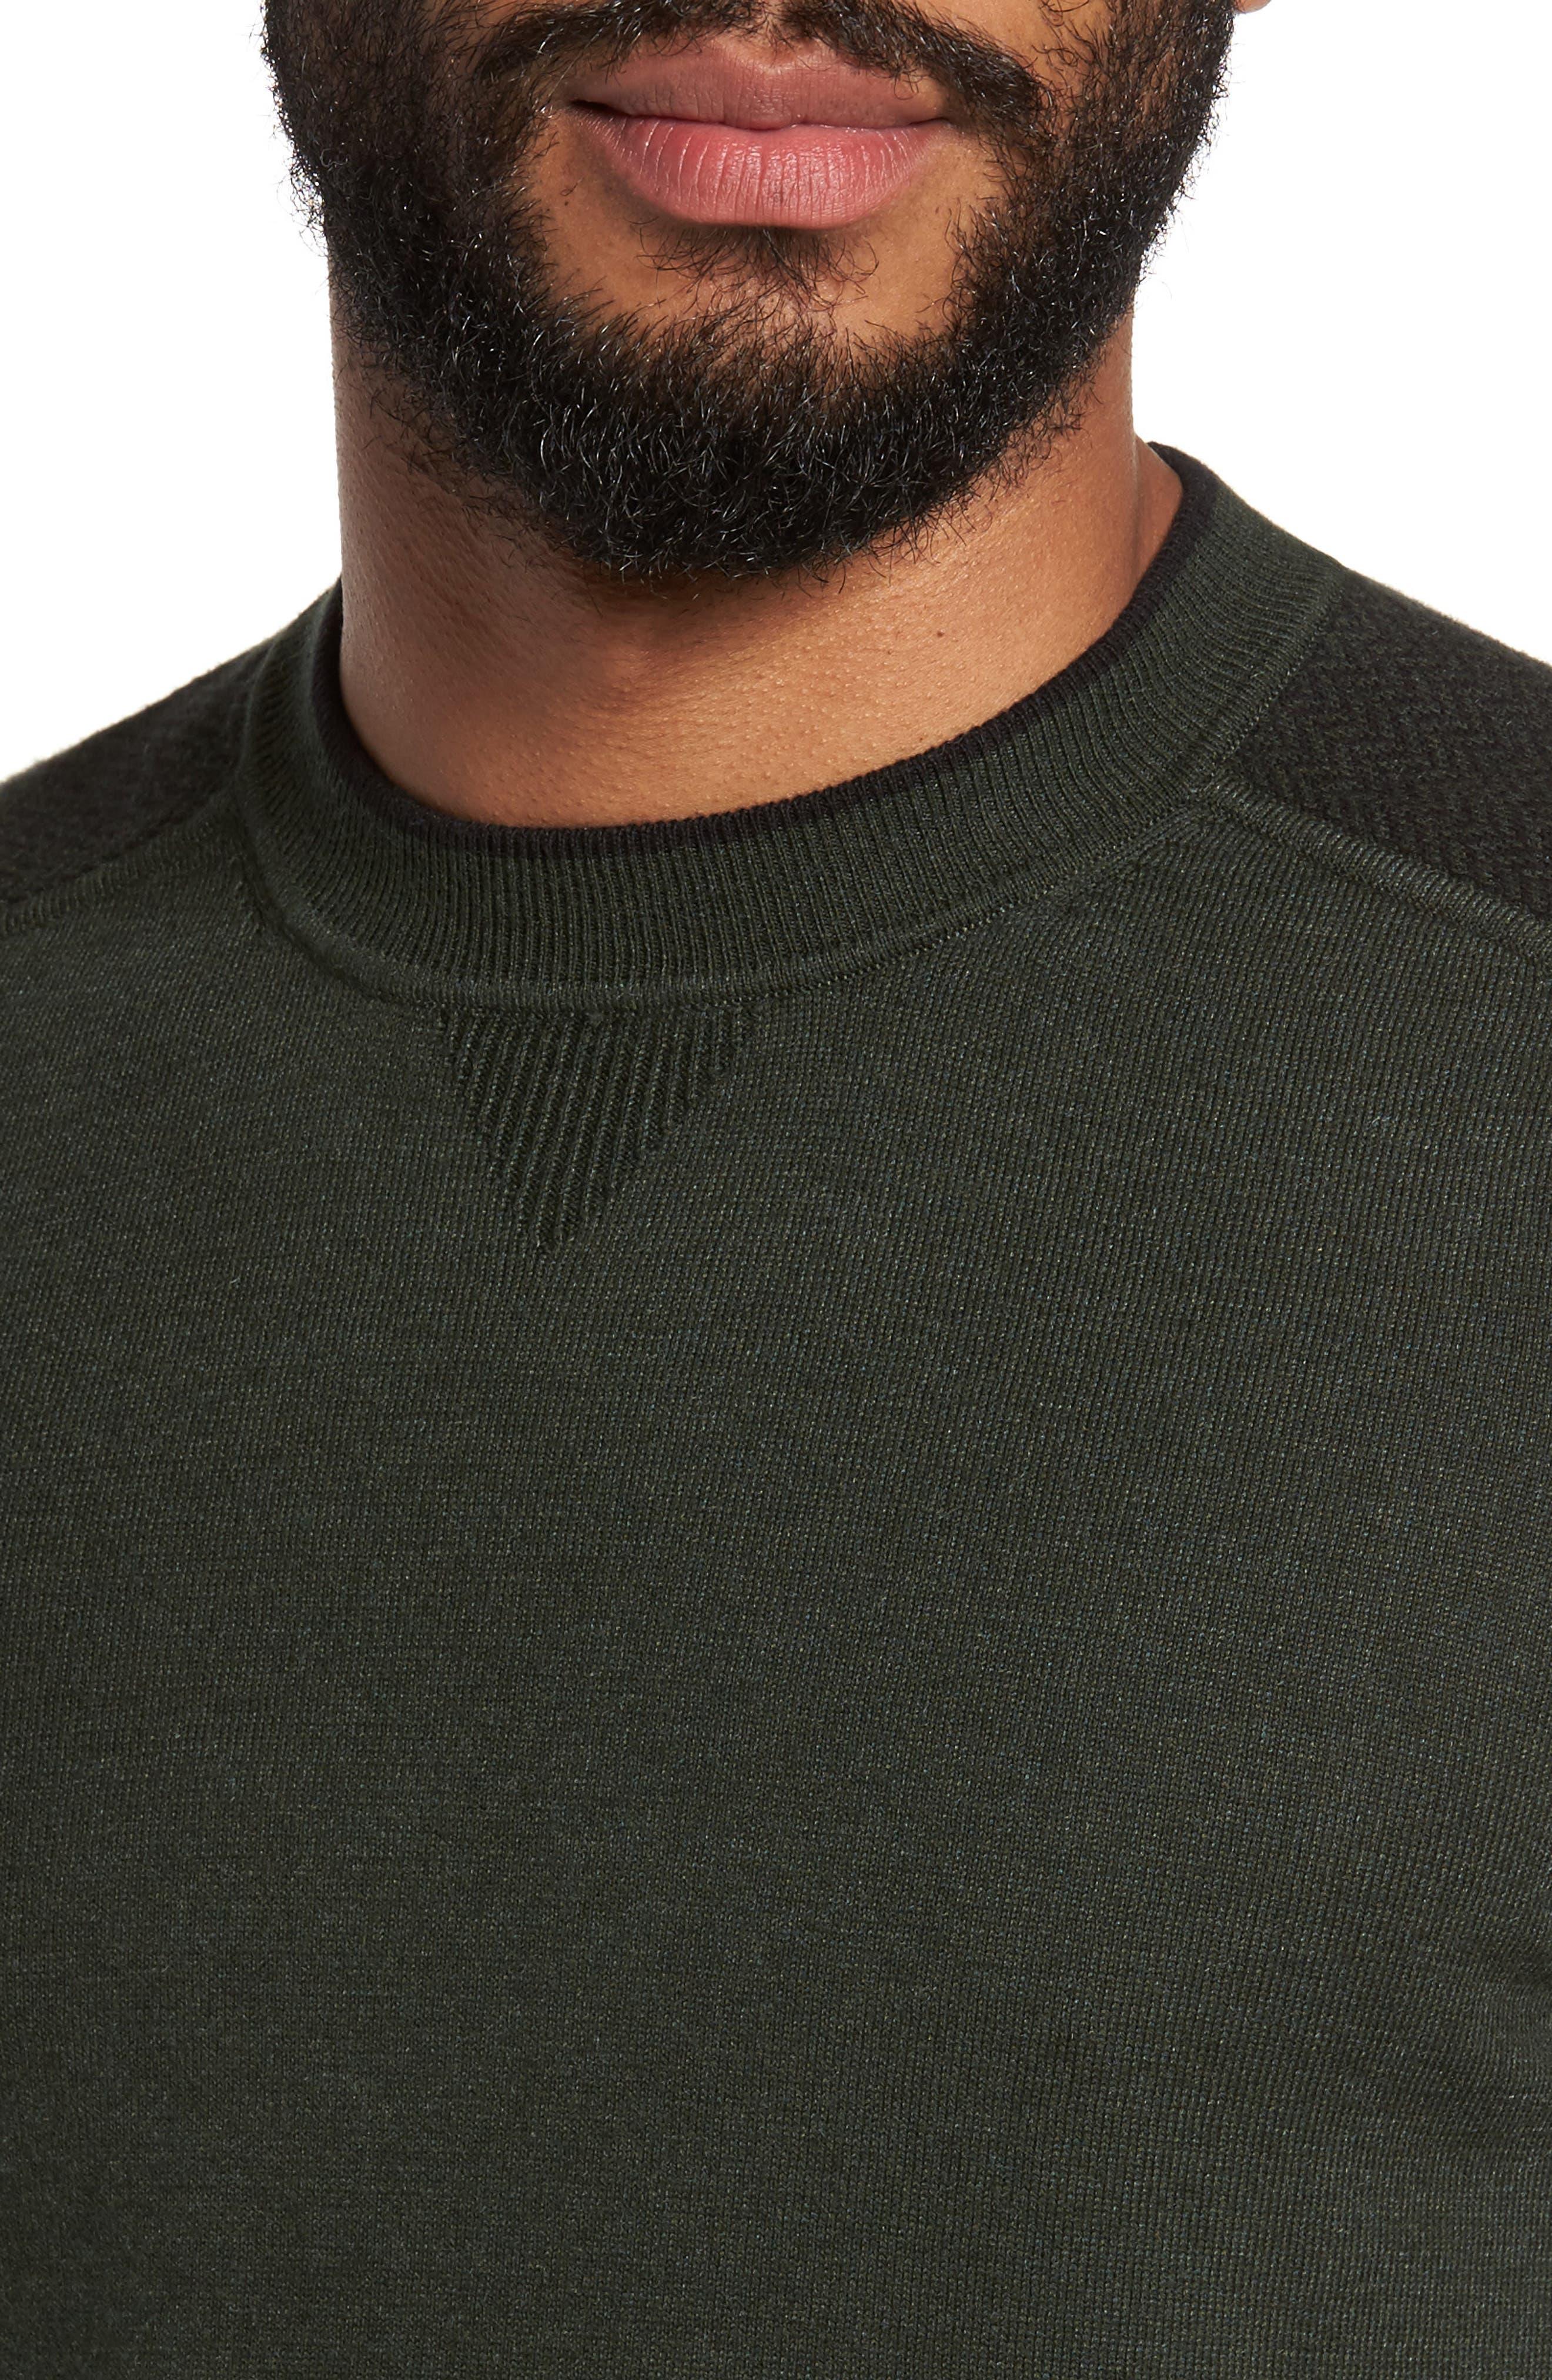 Pepmint Herringbone Sleeve Sweatshirt,                             Alternate thumbnail 4, color,                             Khaki